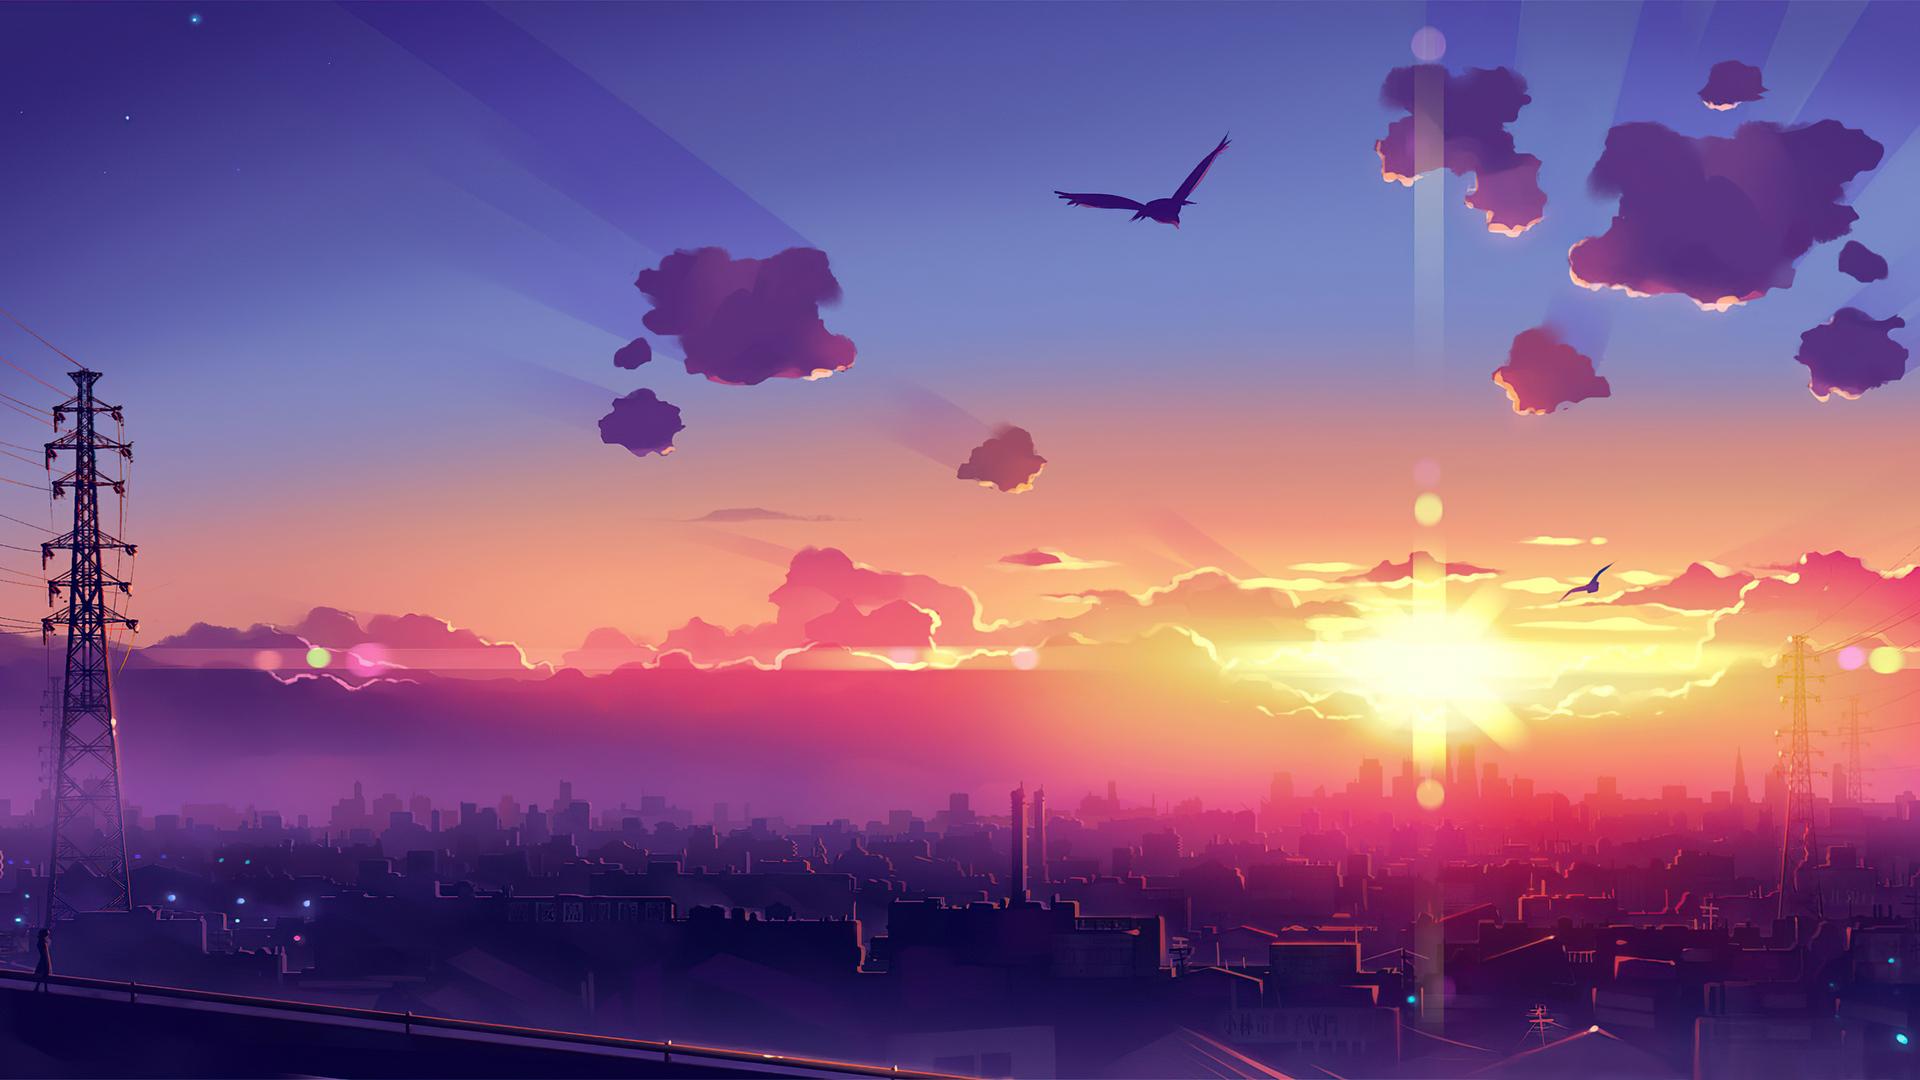 1920x1080 Anime Scenery Sunset 4k Laptop Full HD 1080P HD ...